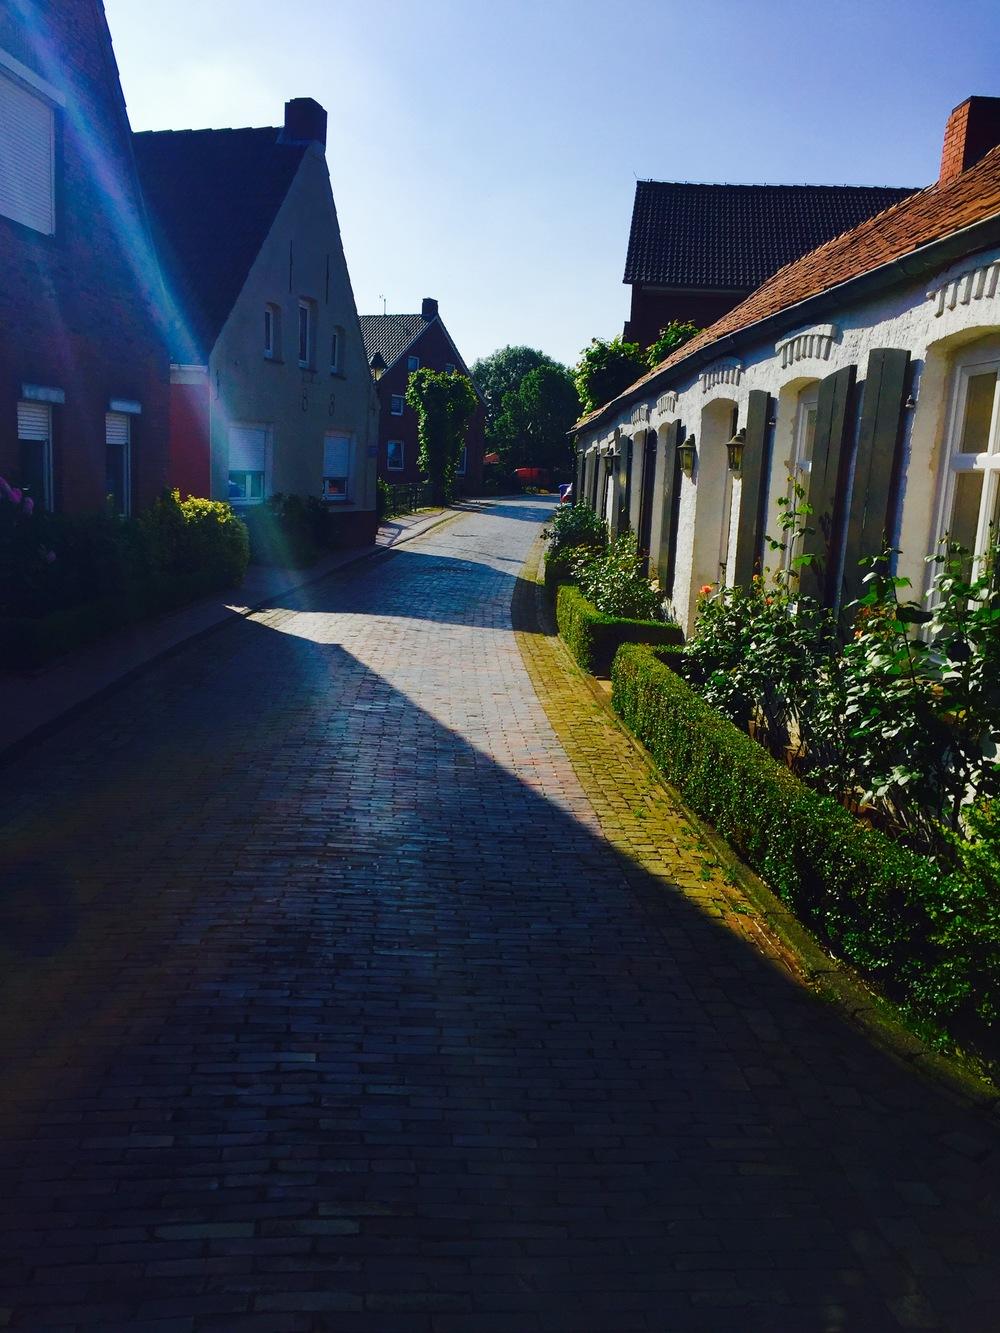 The stunning village of Rysum.